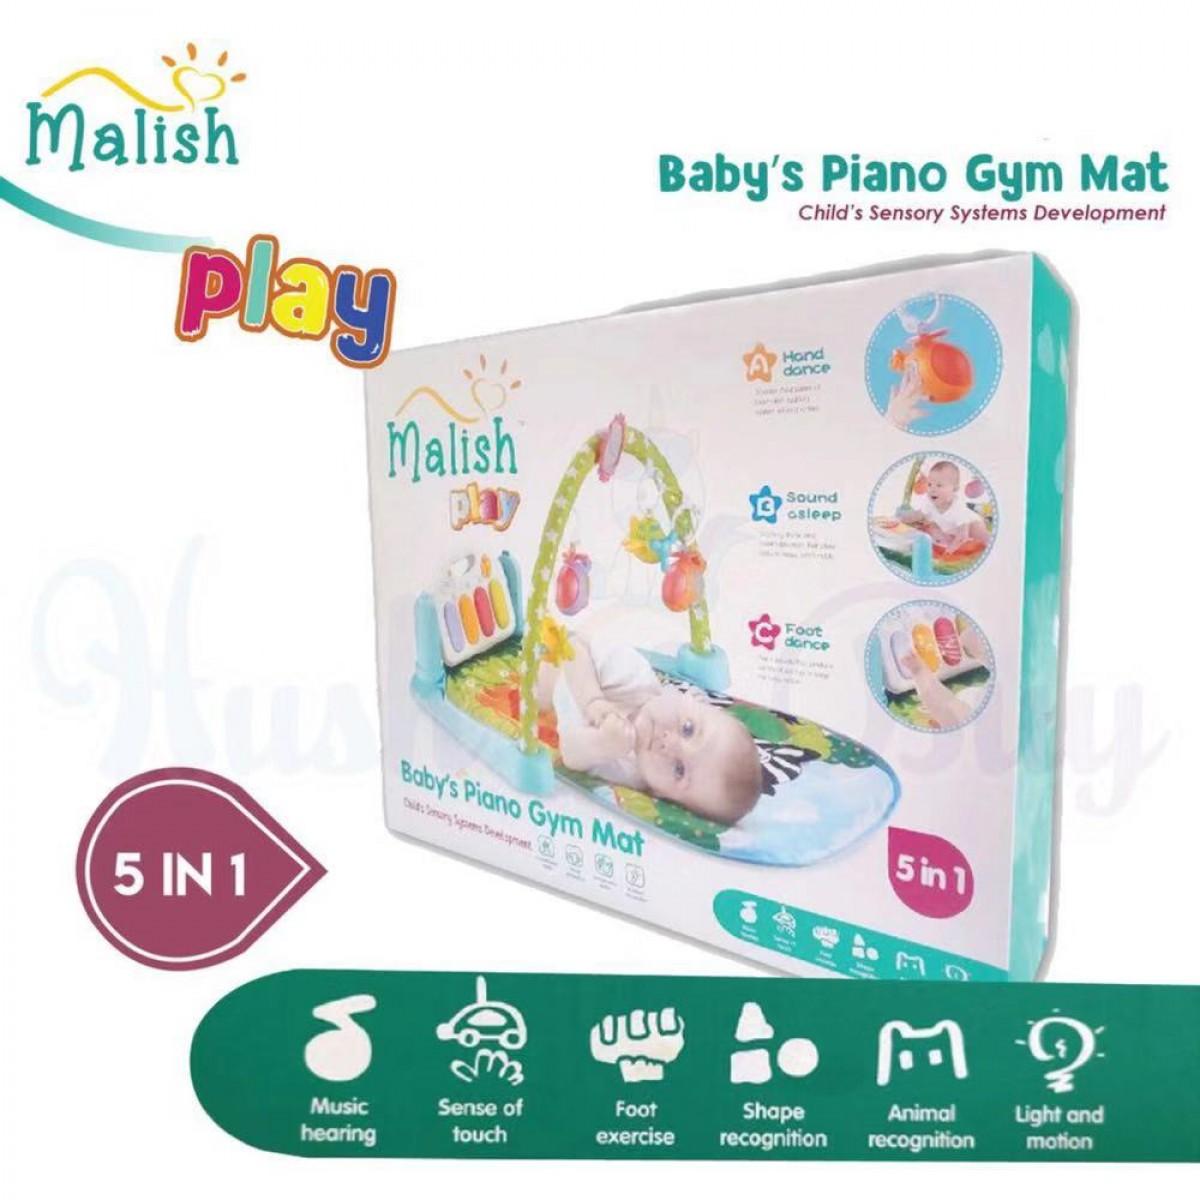 Malish 5-in-1 Baby's Piano Gym Mat